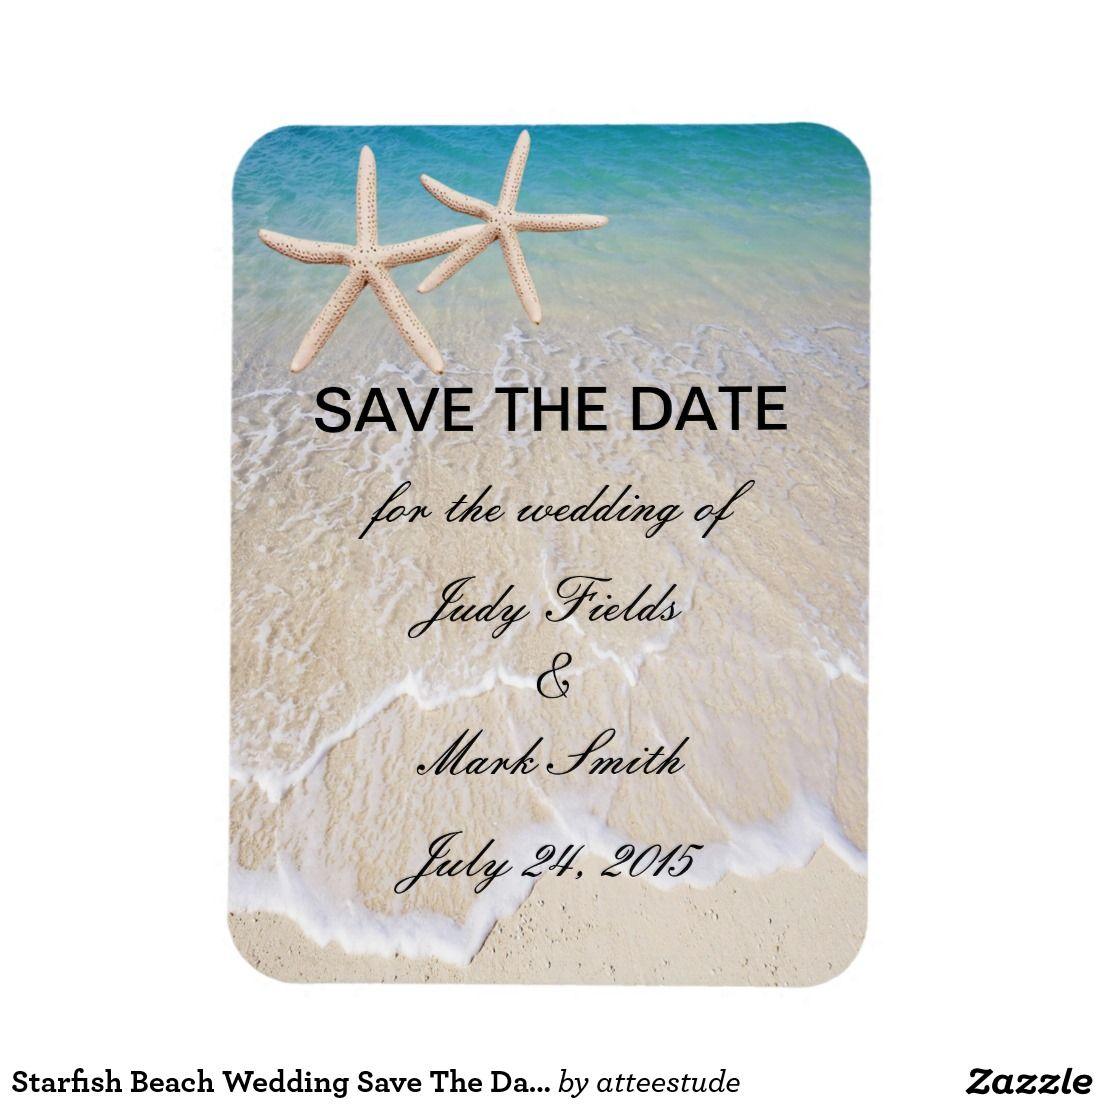 Starfish Beach Wedding Save The Date Magnet | WEDDING: SAVE THE DATE ...